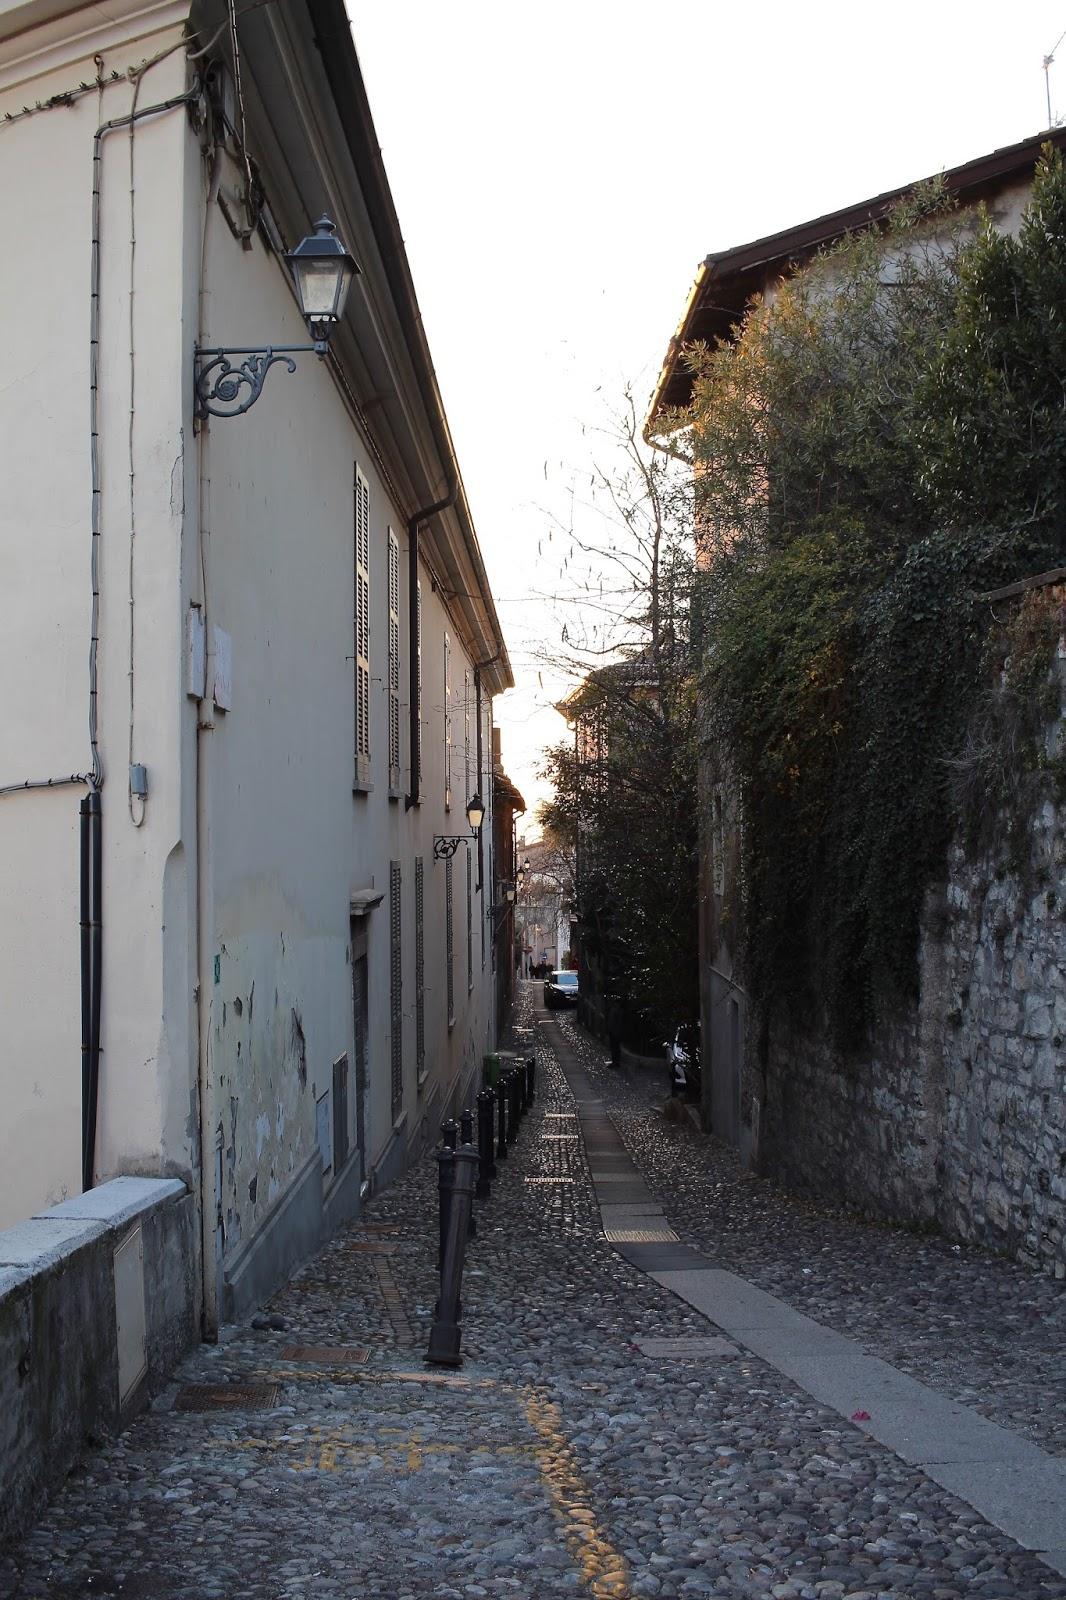 brescia italy streets peexo blog